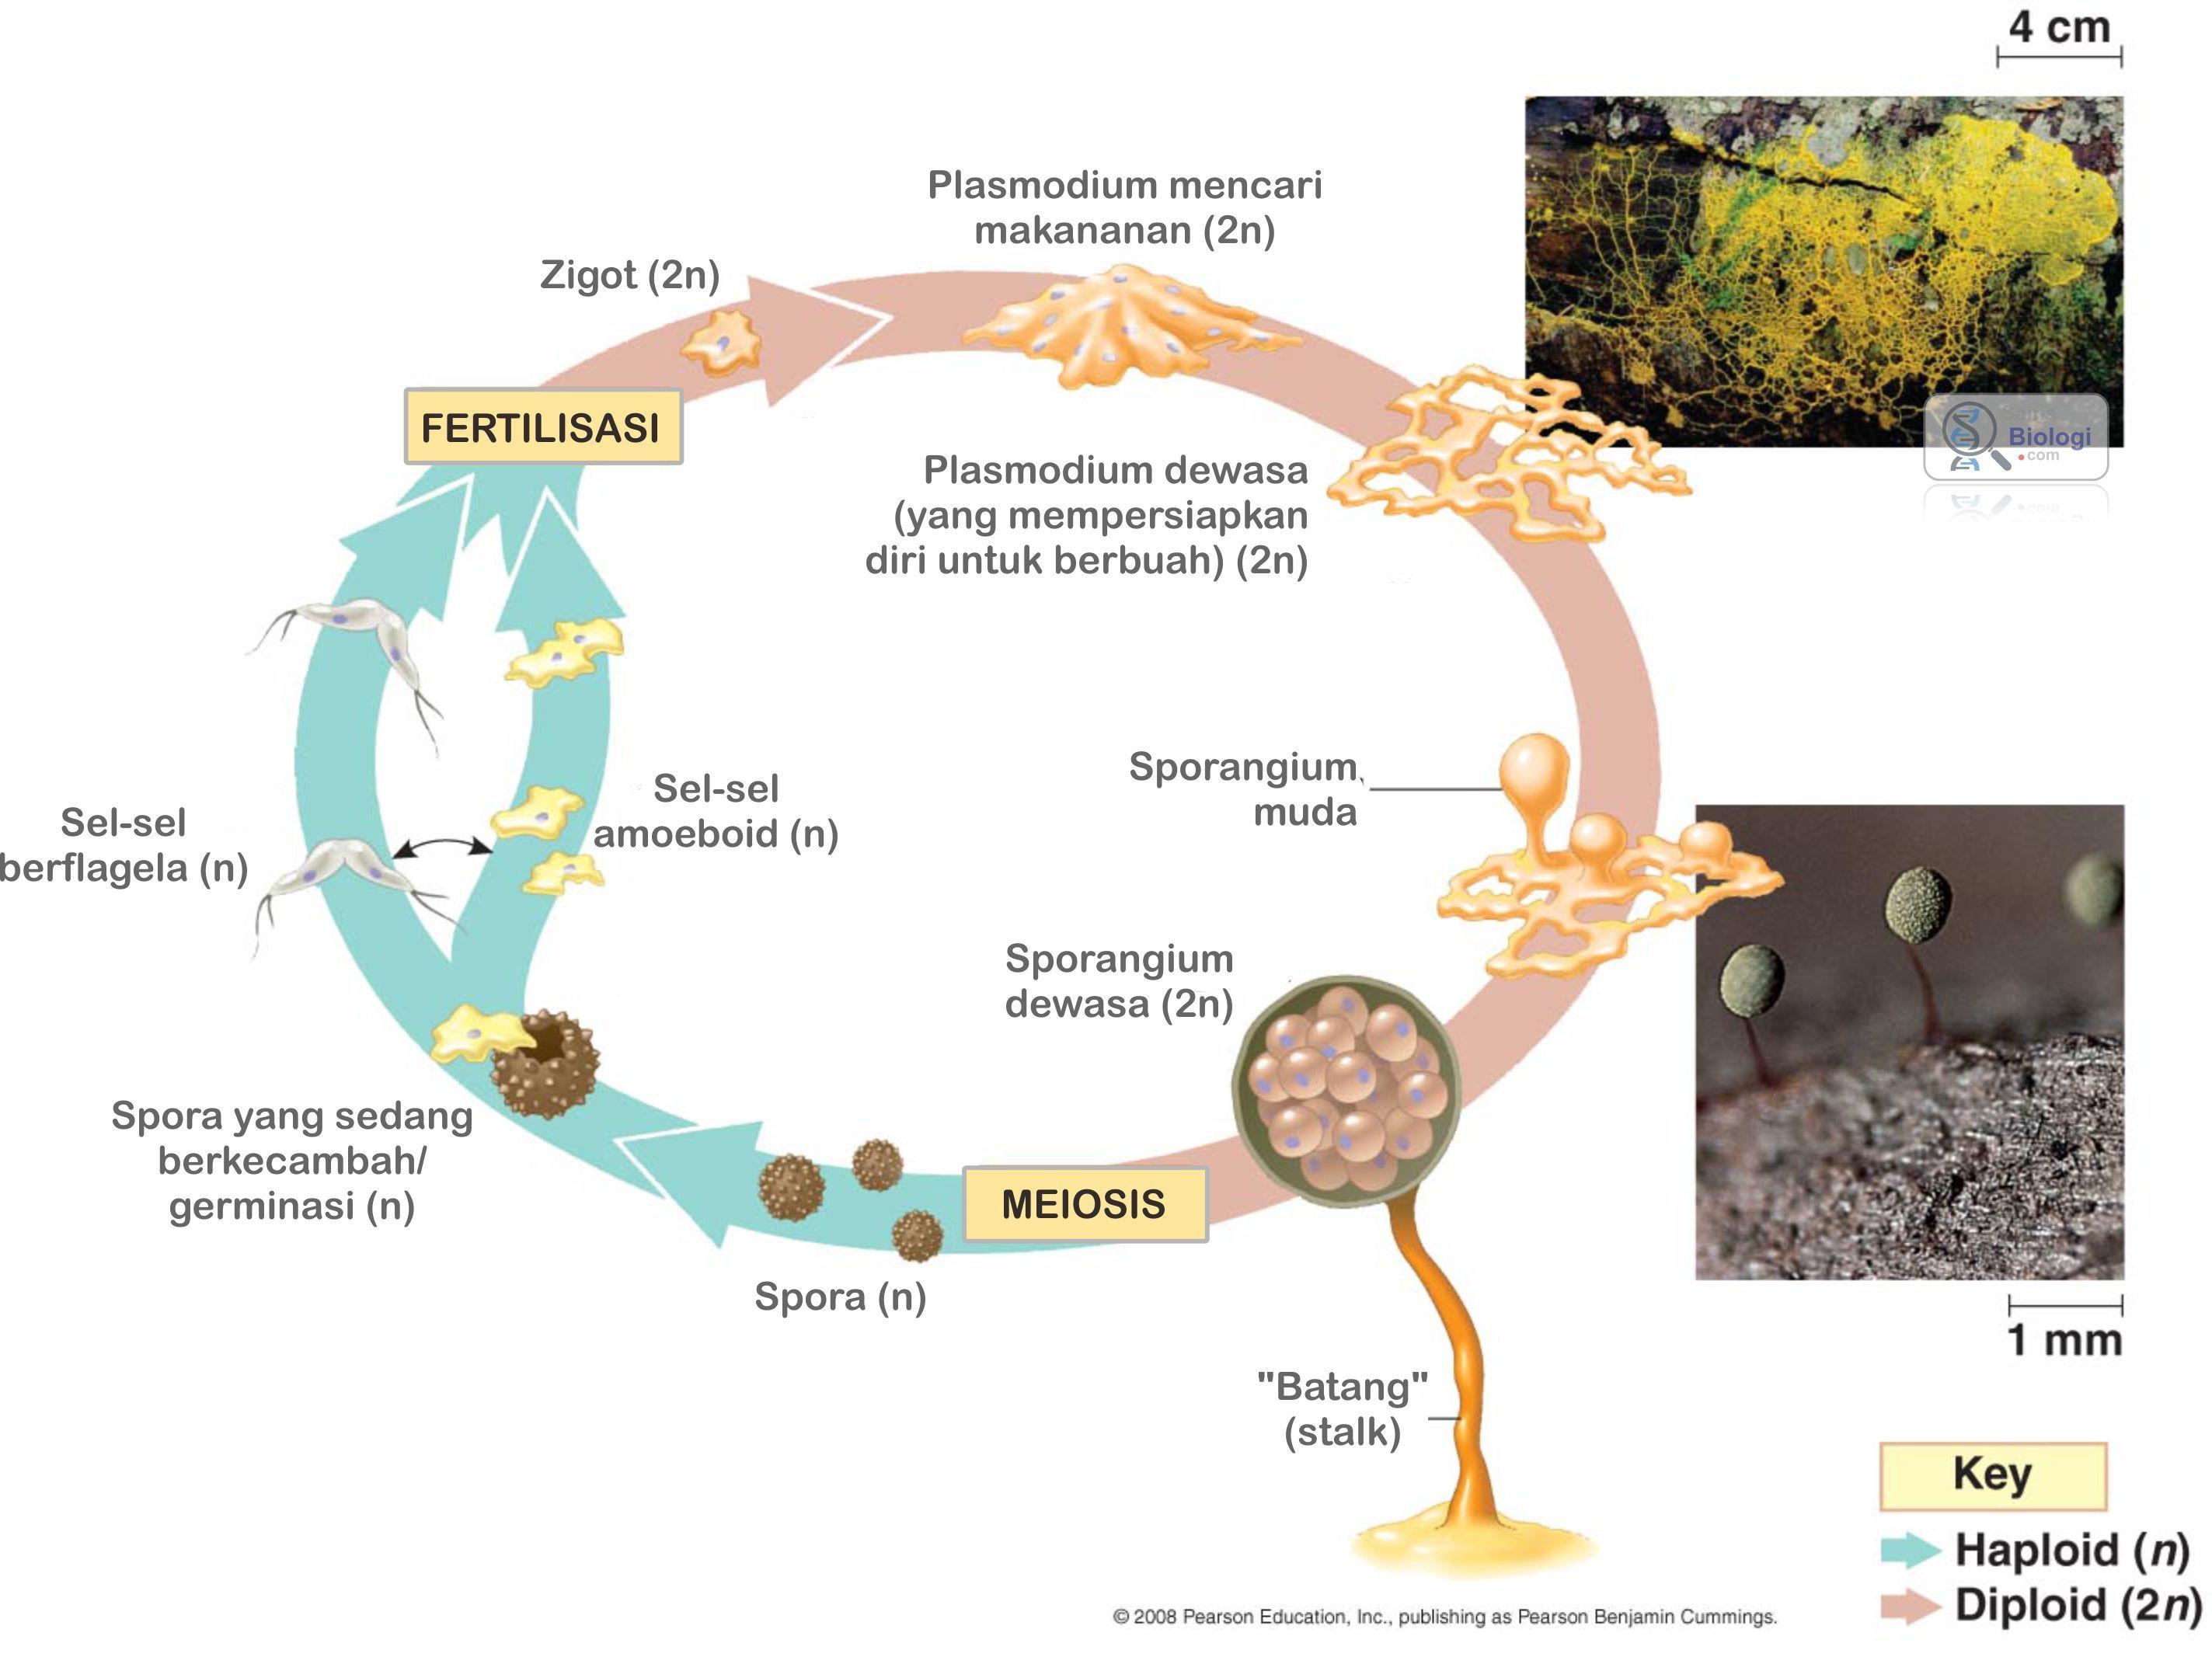 Gambar Siklus hidup jamur lendir Myxomycota  termasuk